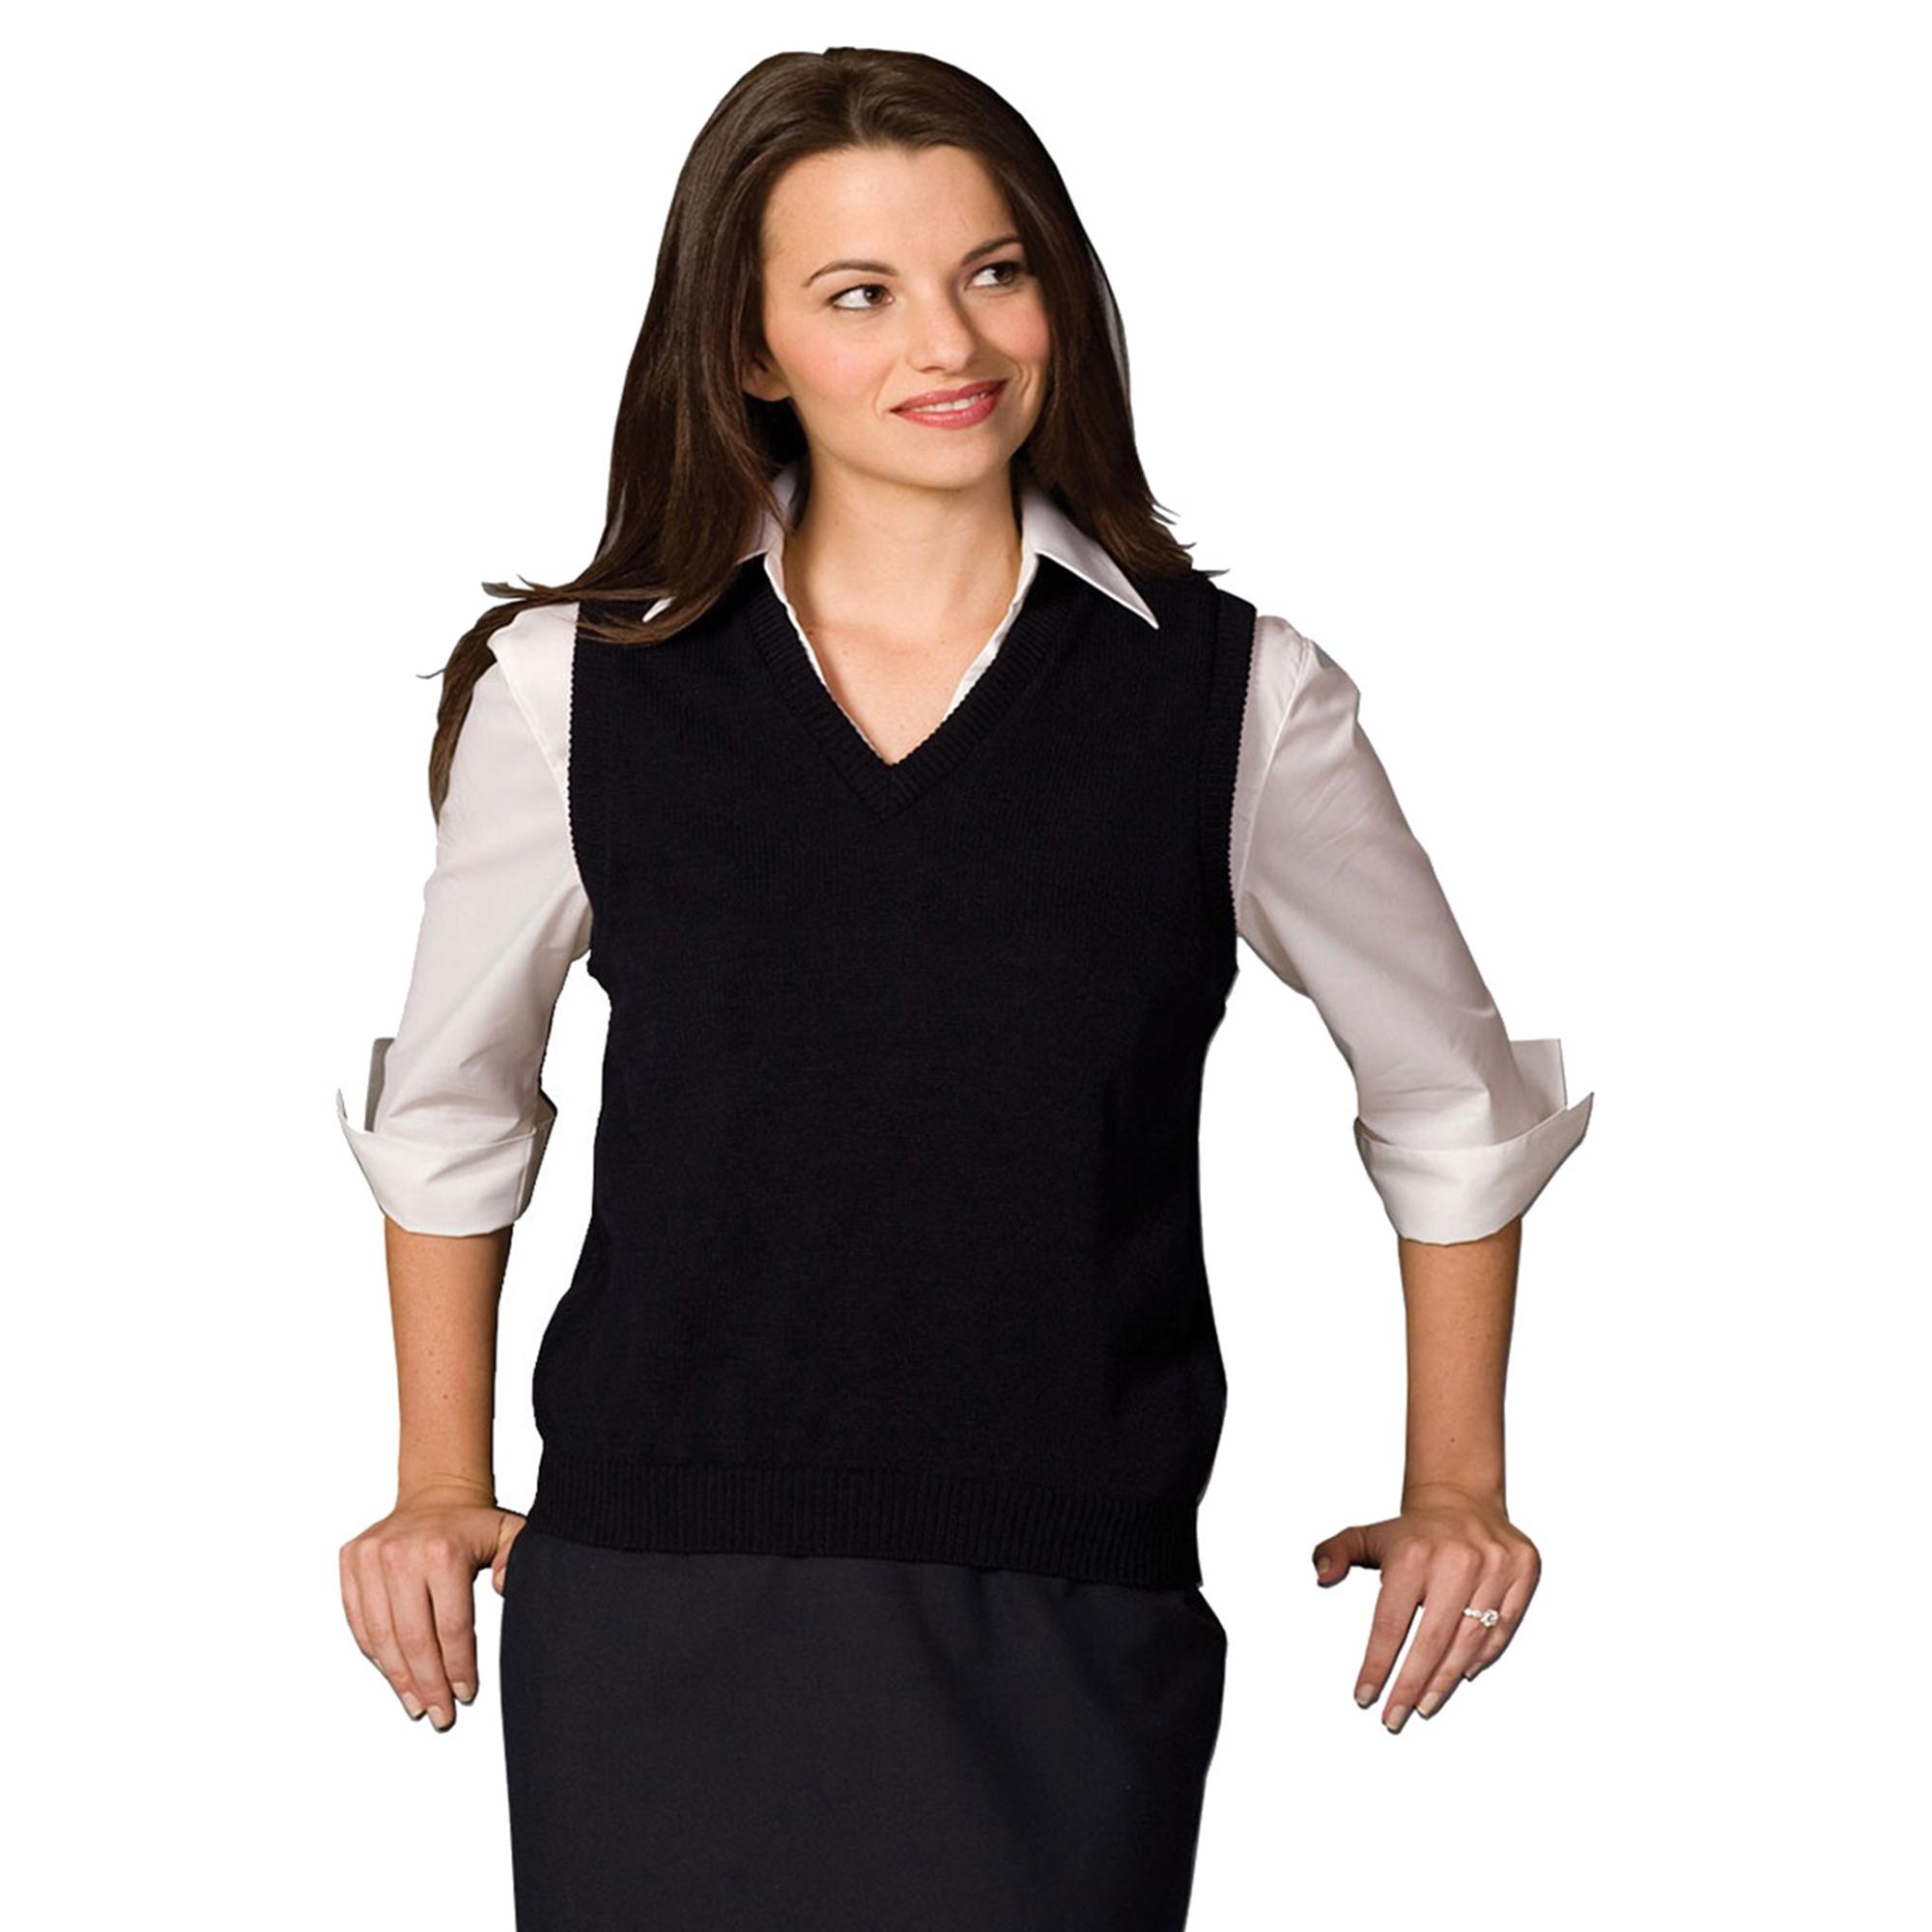 Edwards 461 Women's Colorfast V-Neck Sweater Vest